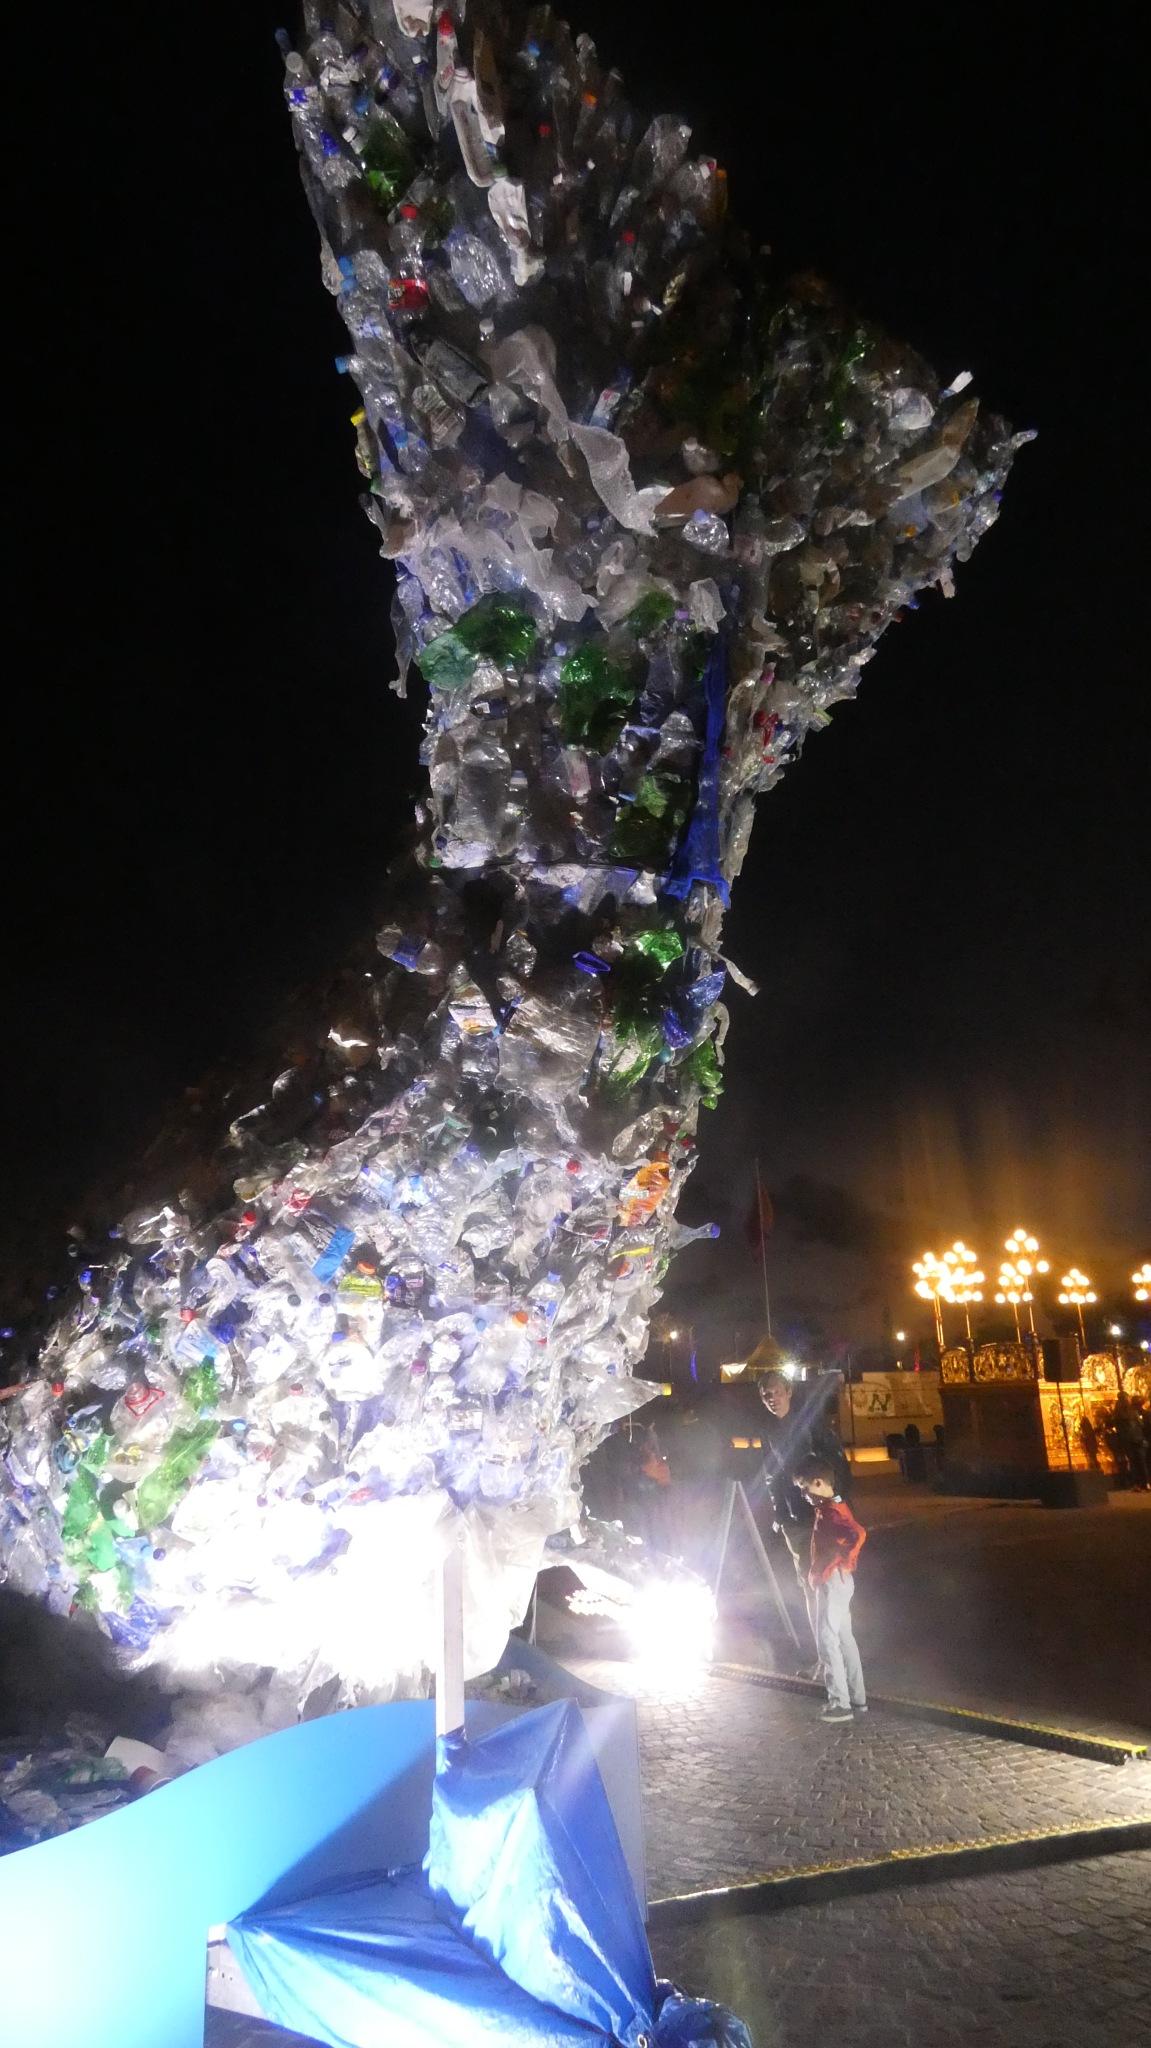 Notte Bianca Festival by Jorge Giro